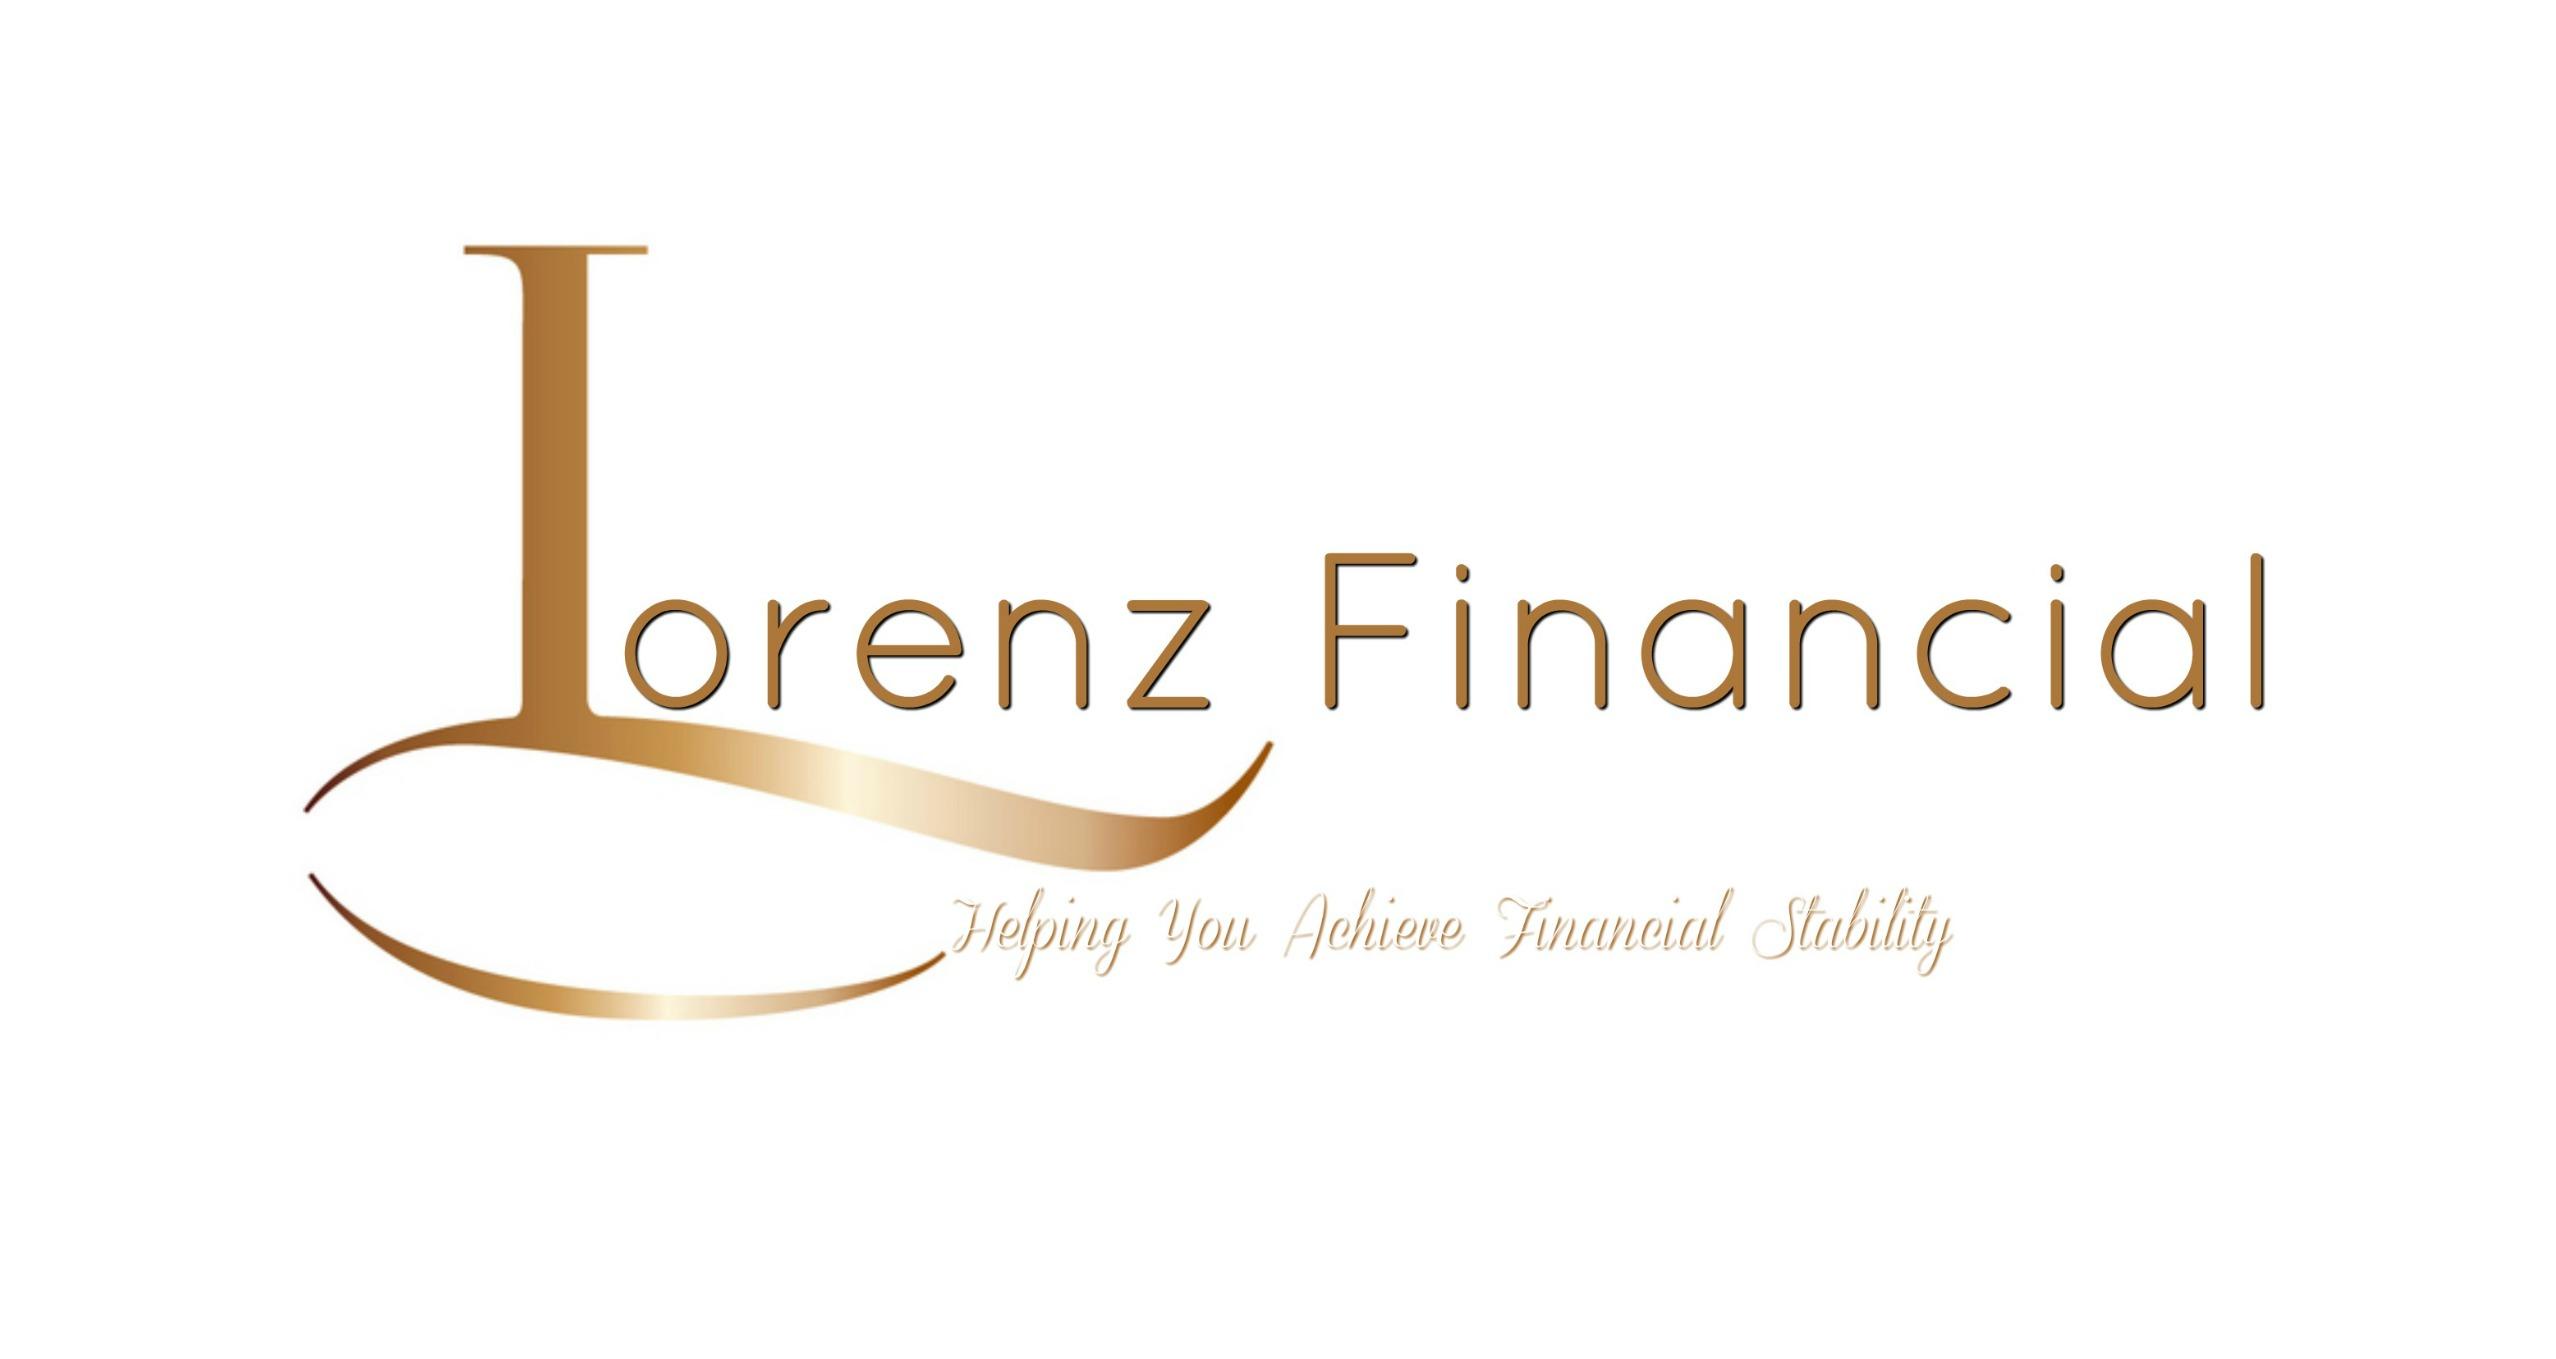 Lorenz Financial